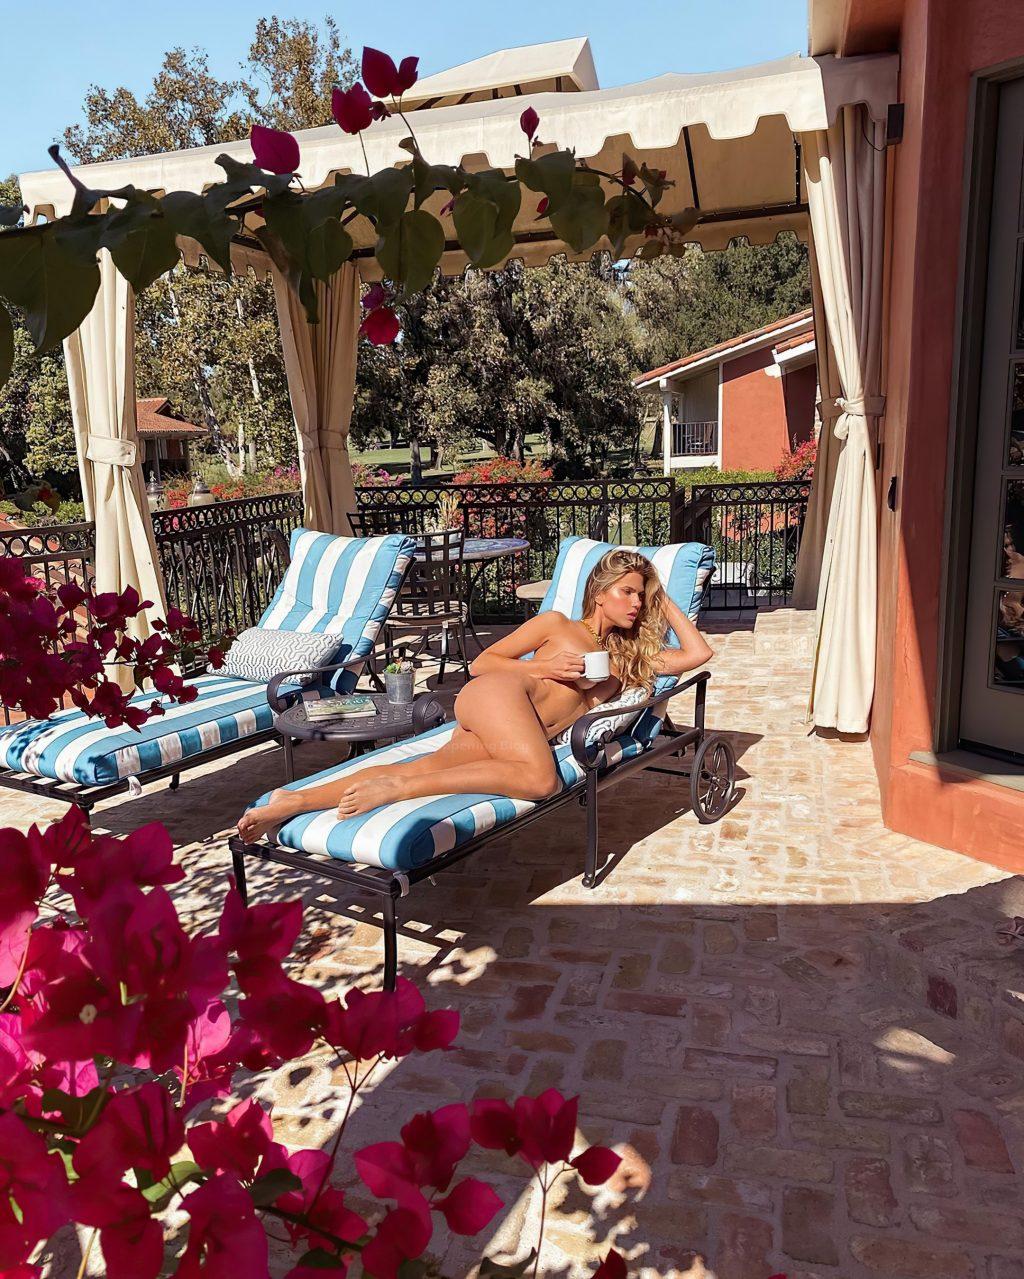 Kara Del Toro Poses Fully Naked (2 Photos)